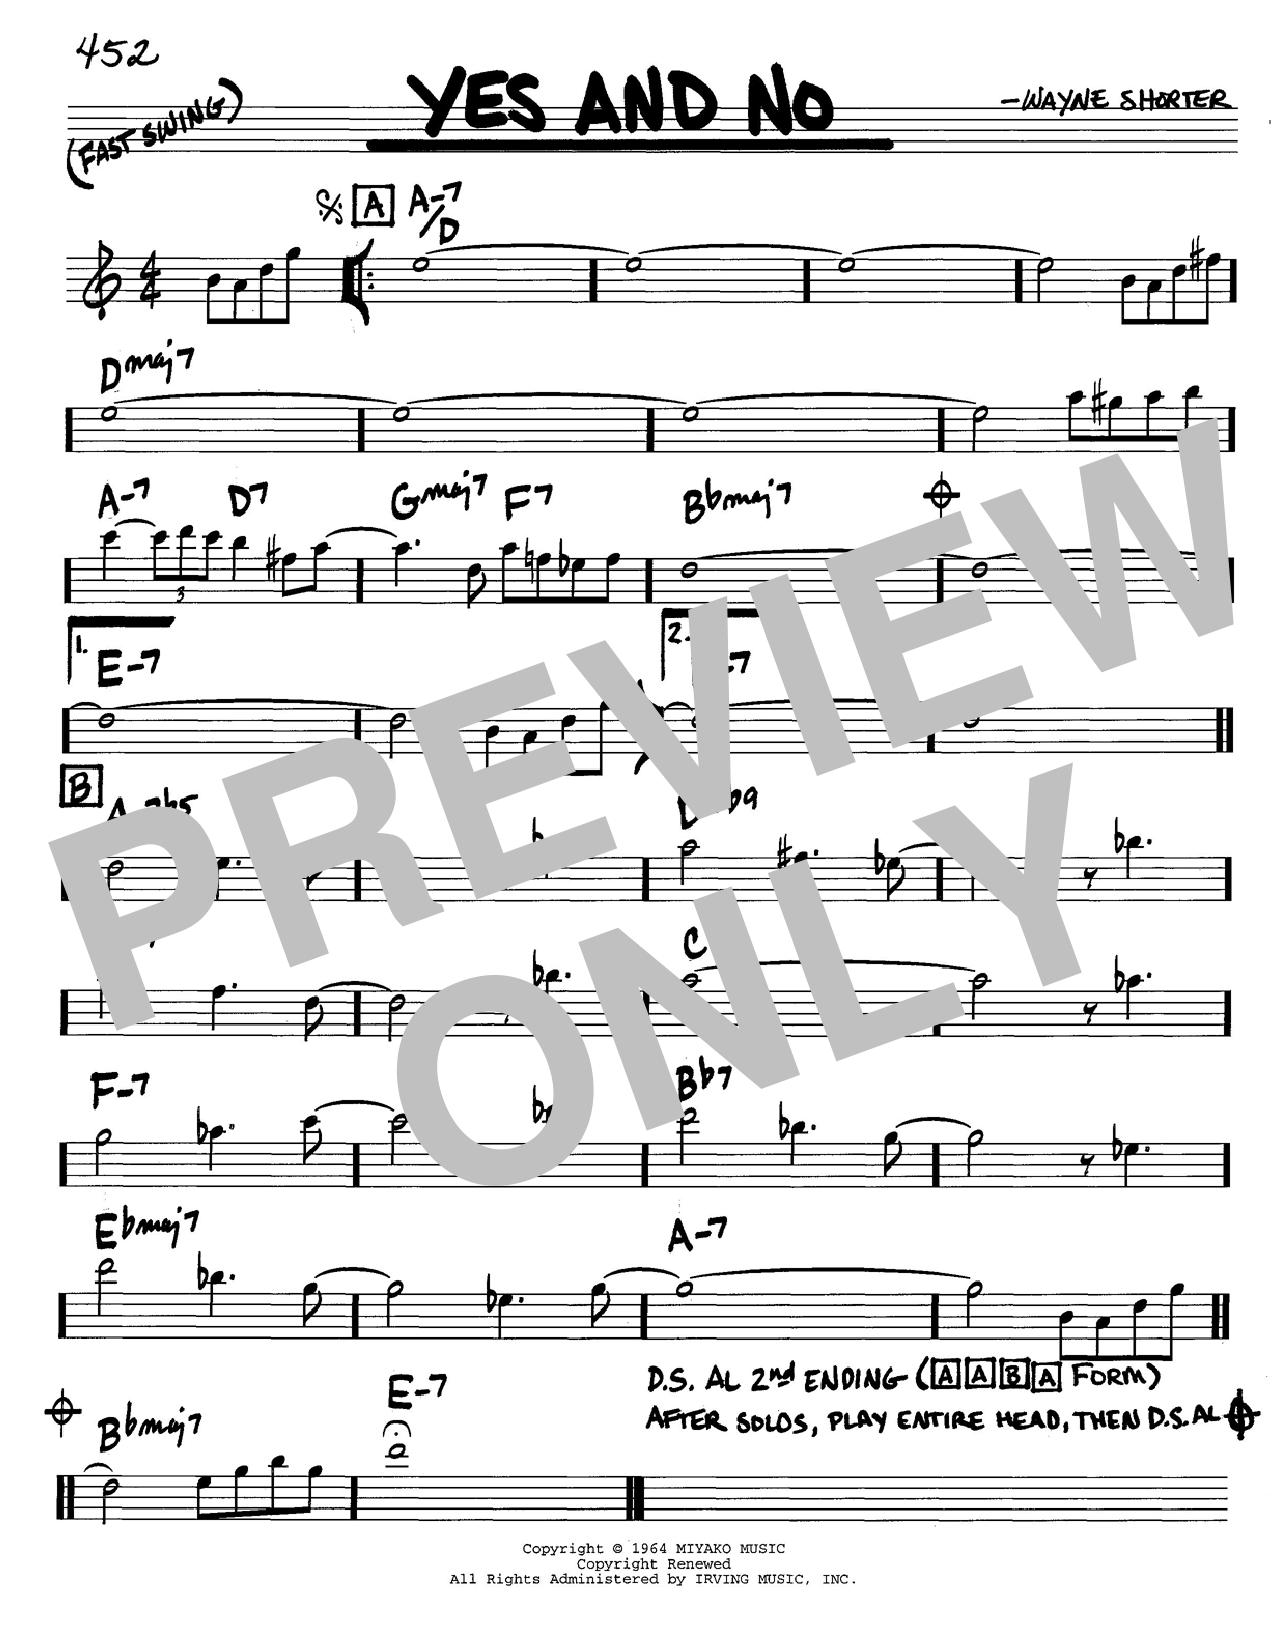 Wayne Shorter Yes And No sheet music notes and chords. Download Printable PDF.